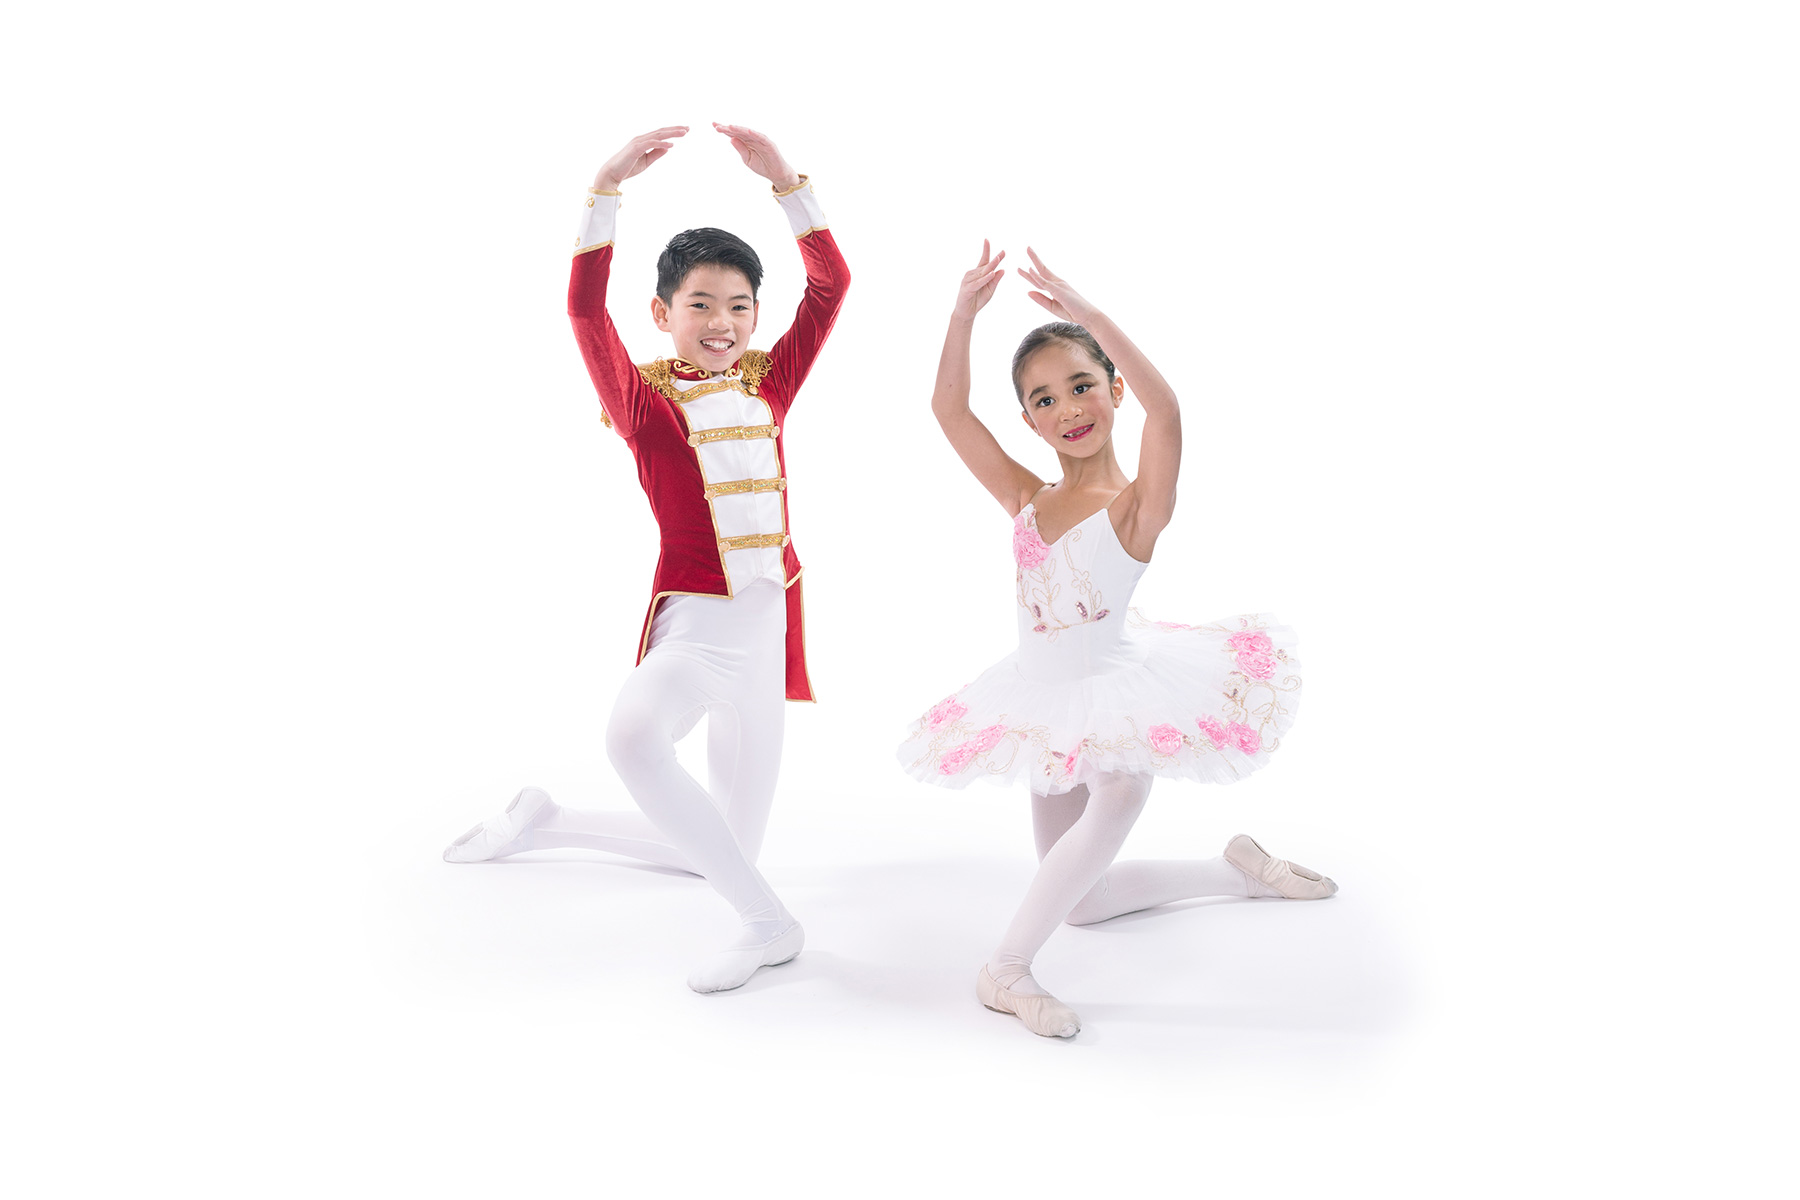 Dance Creations Ballet Dancers Posed in Nutrcracker attire.